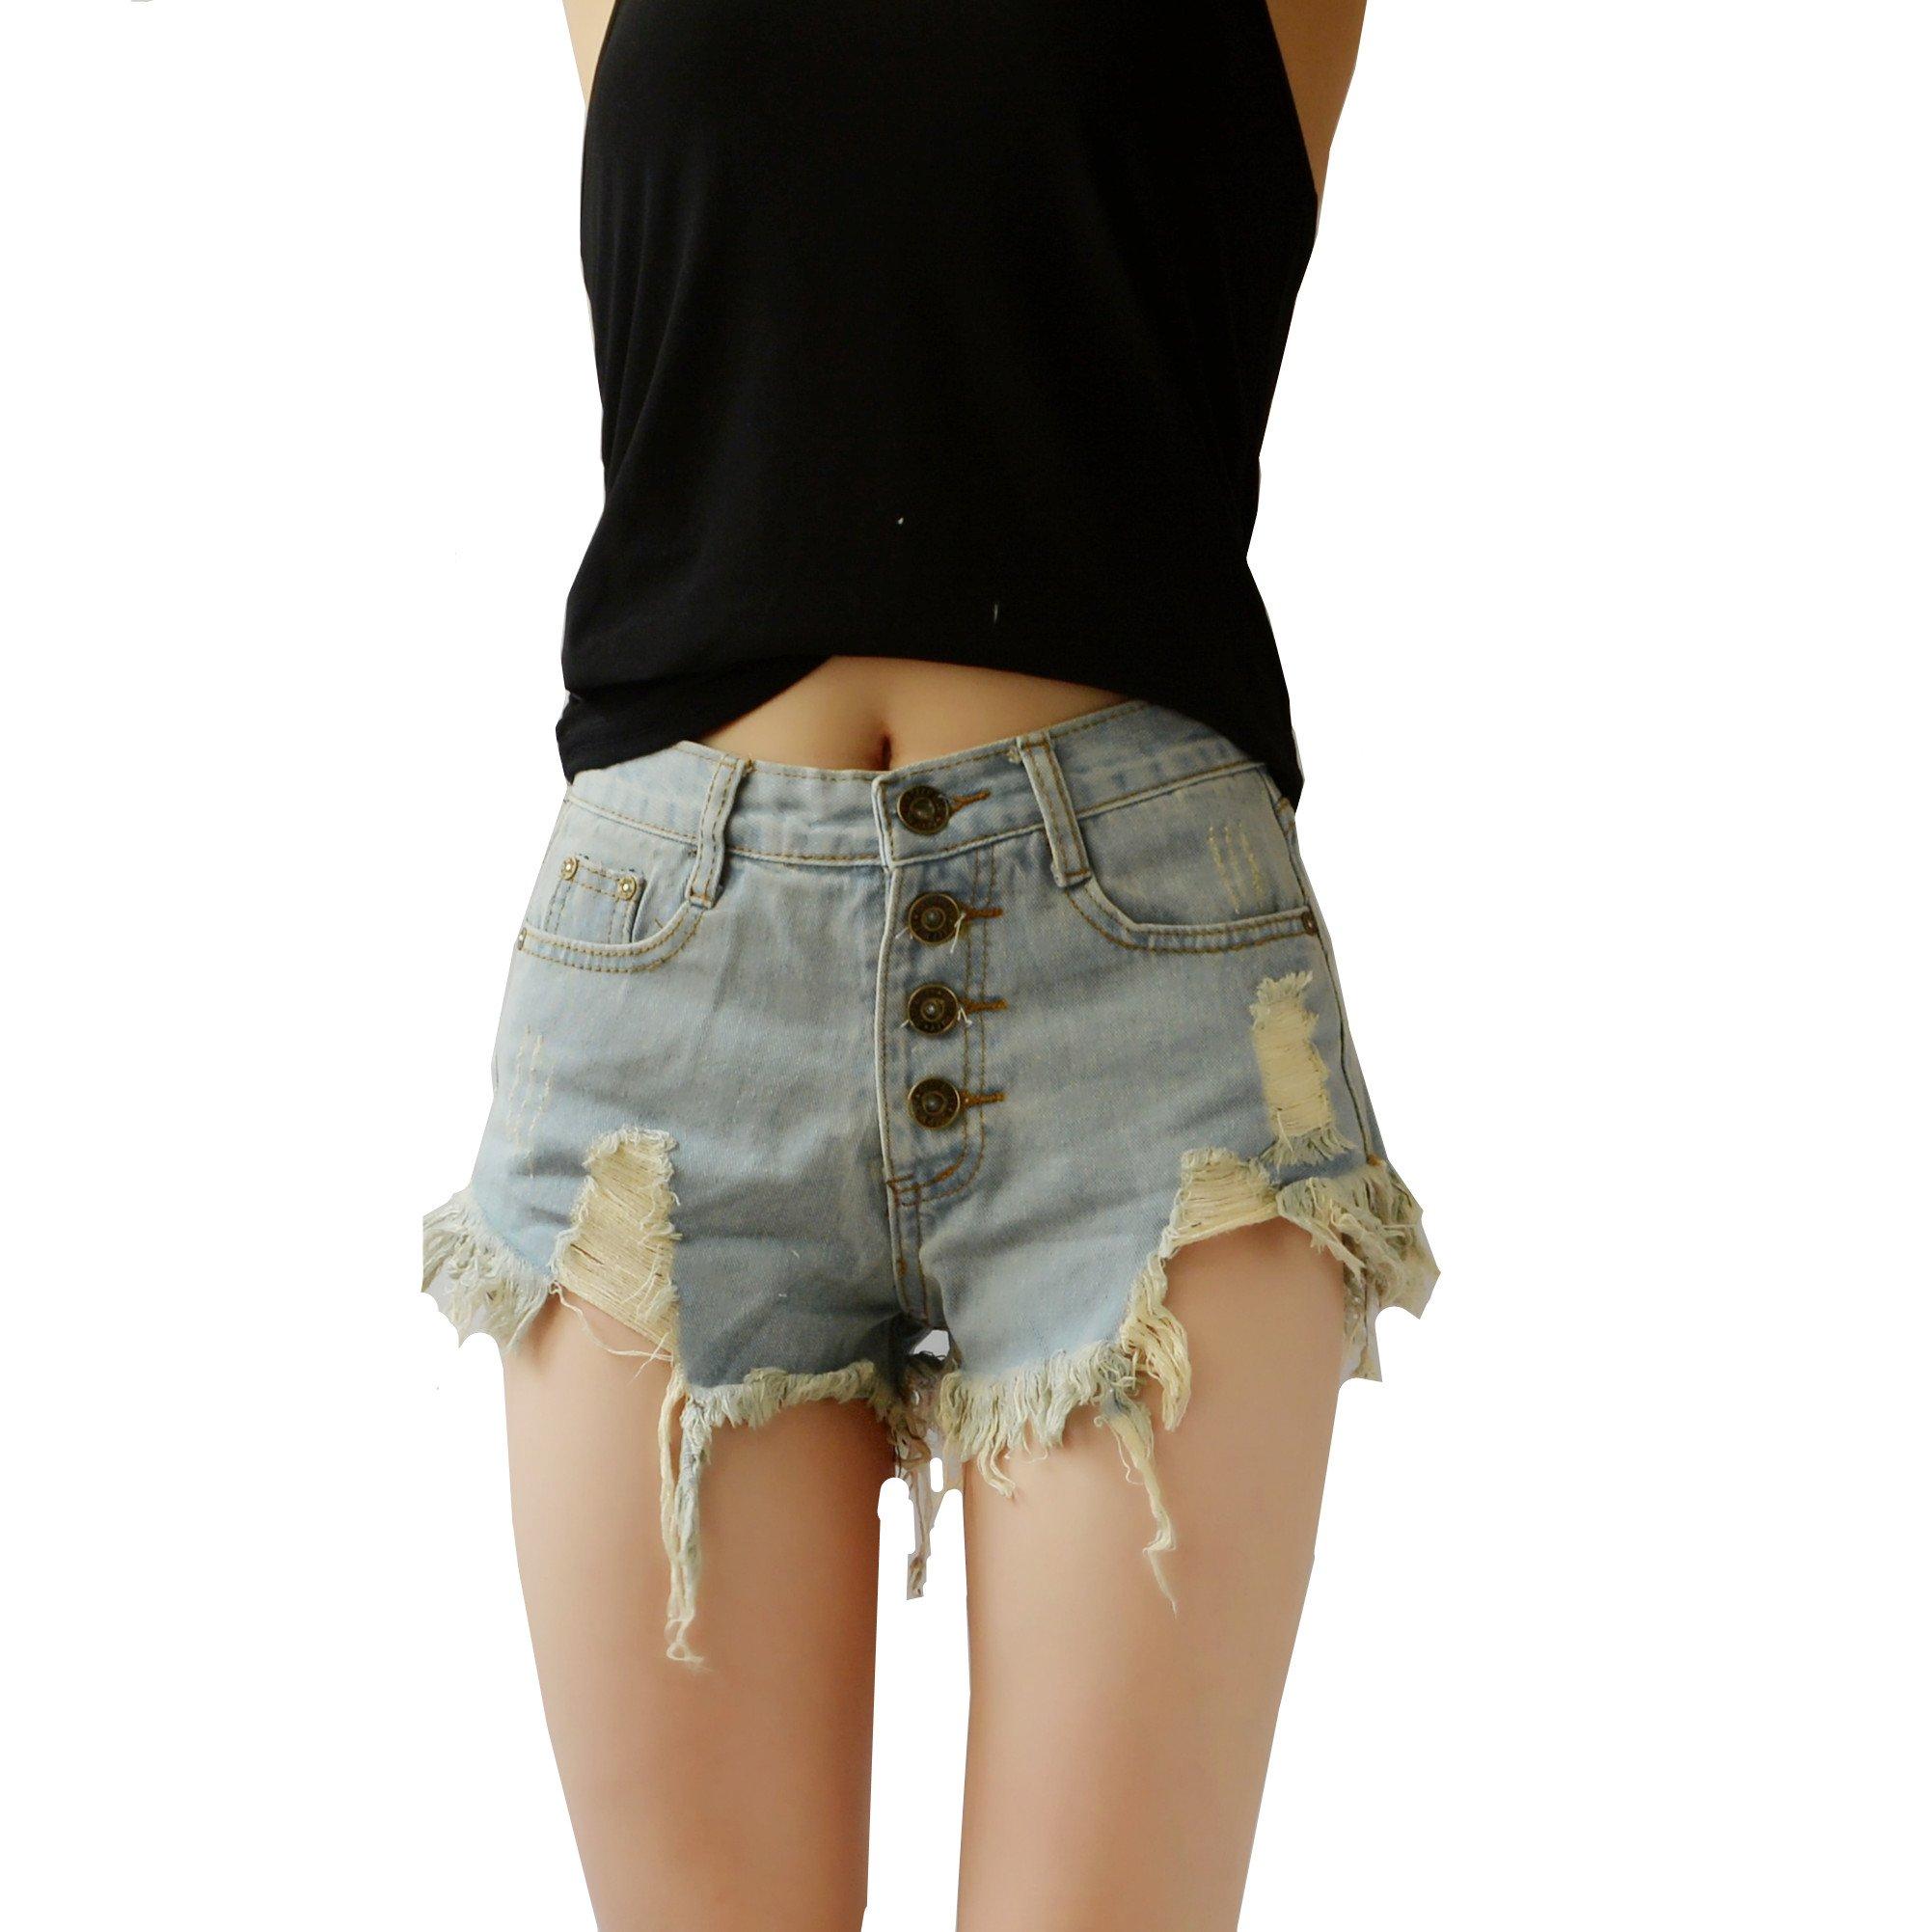 YSJ Women's Mid Waist Denim Shorts Retro Ripped Vintage Jeans Short (M, Jeans Light Blue)